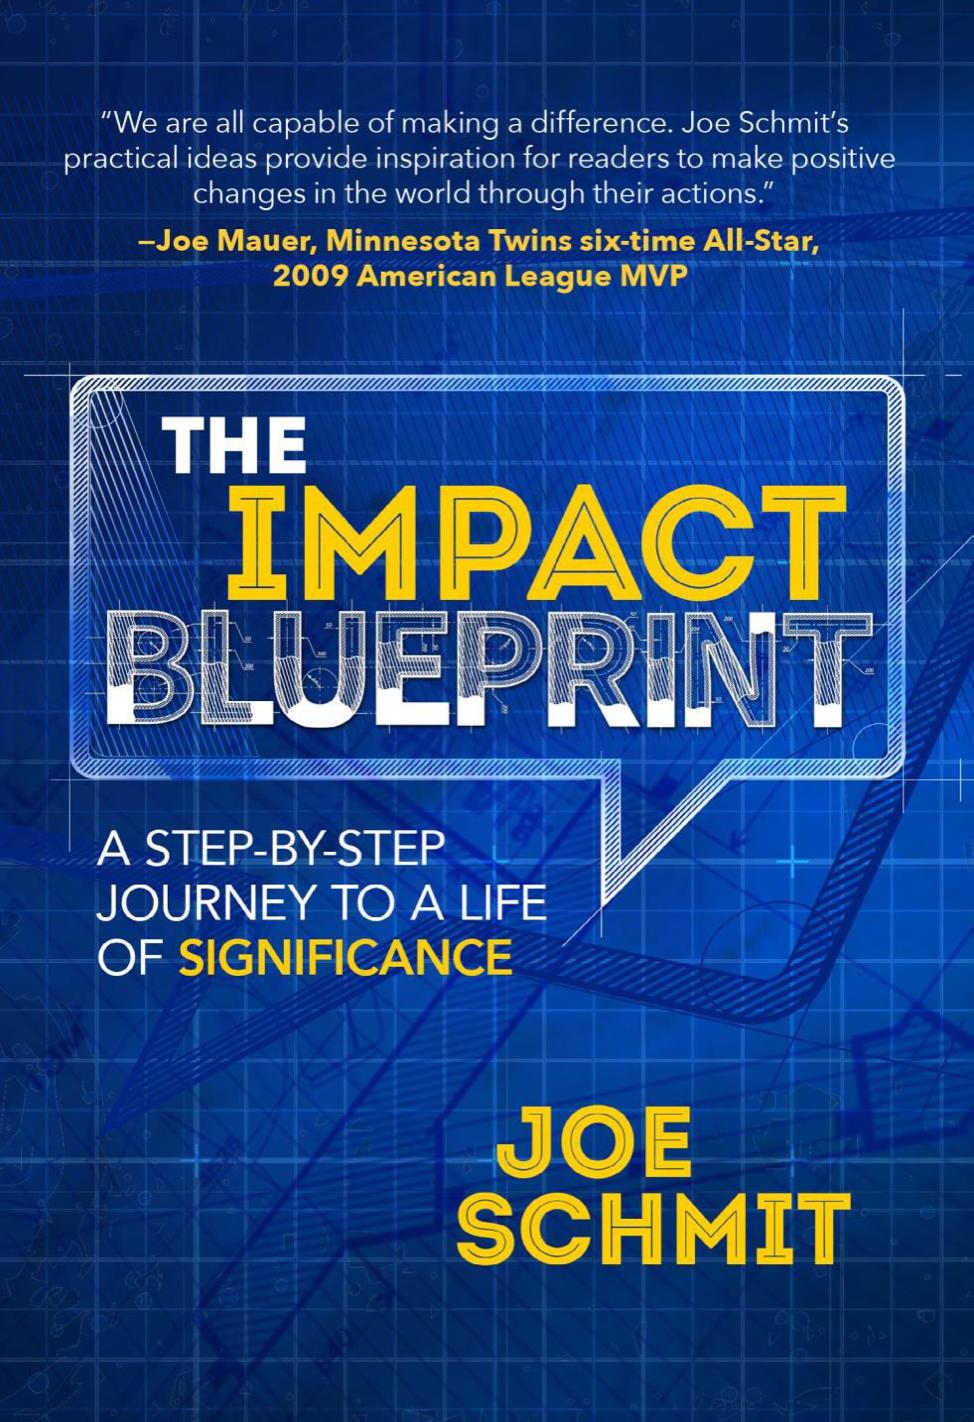 ImpactBlueprint